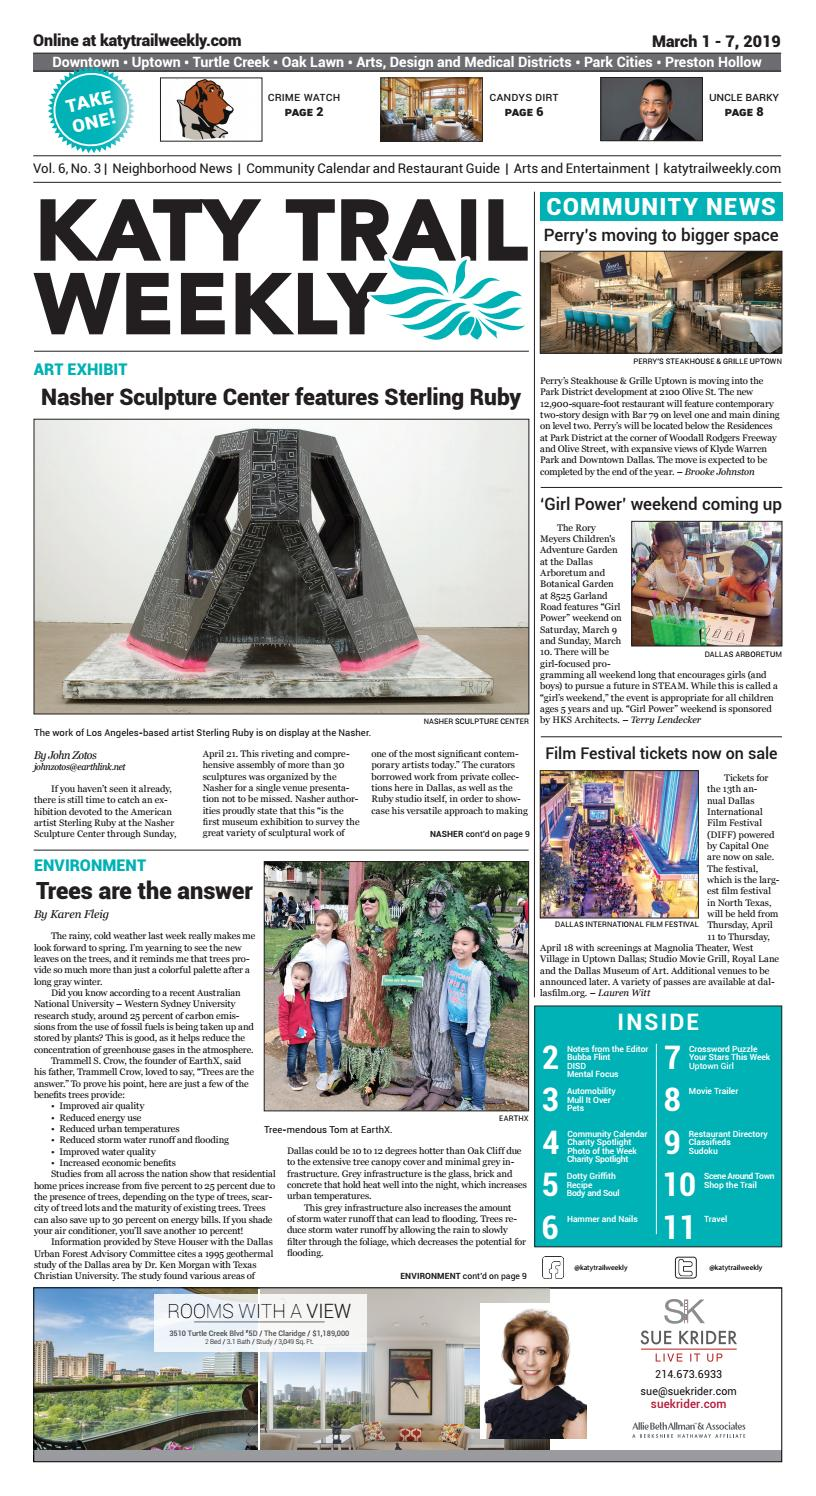 KTW 03-01-19 by Katy Trail Weekly - issuu